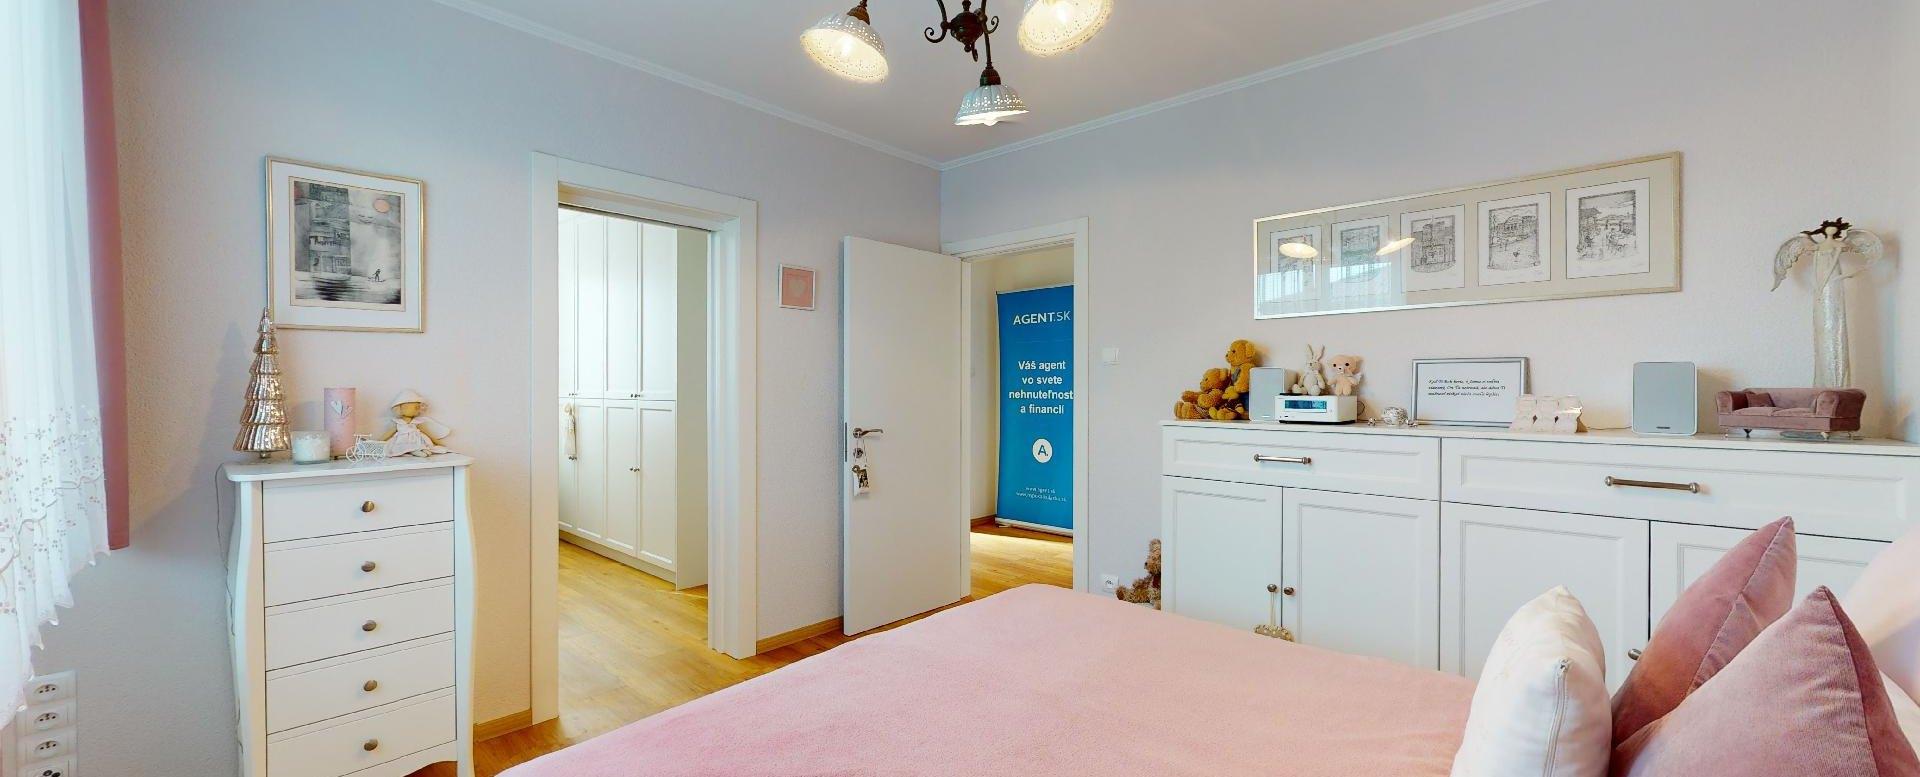 spálňa s manželskou posteľou a komodami